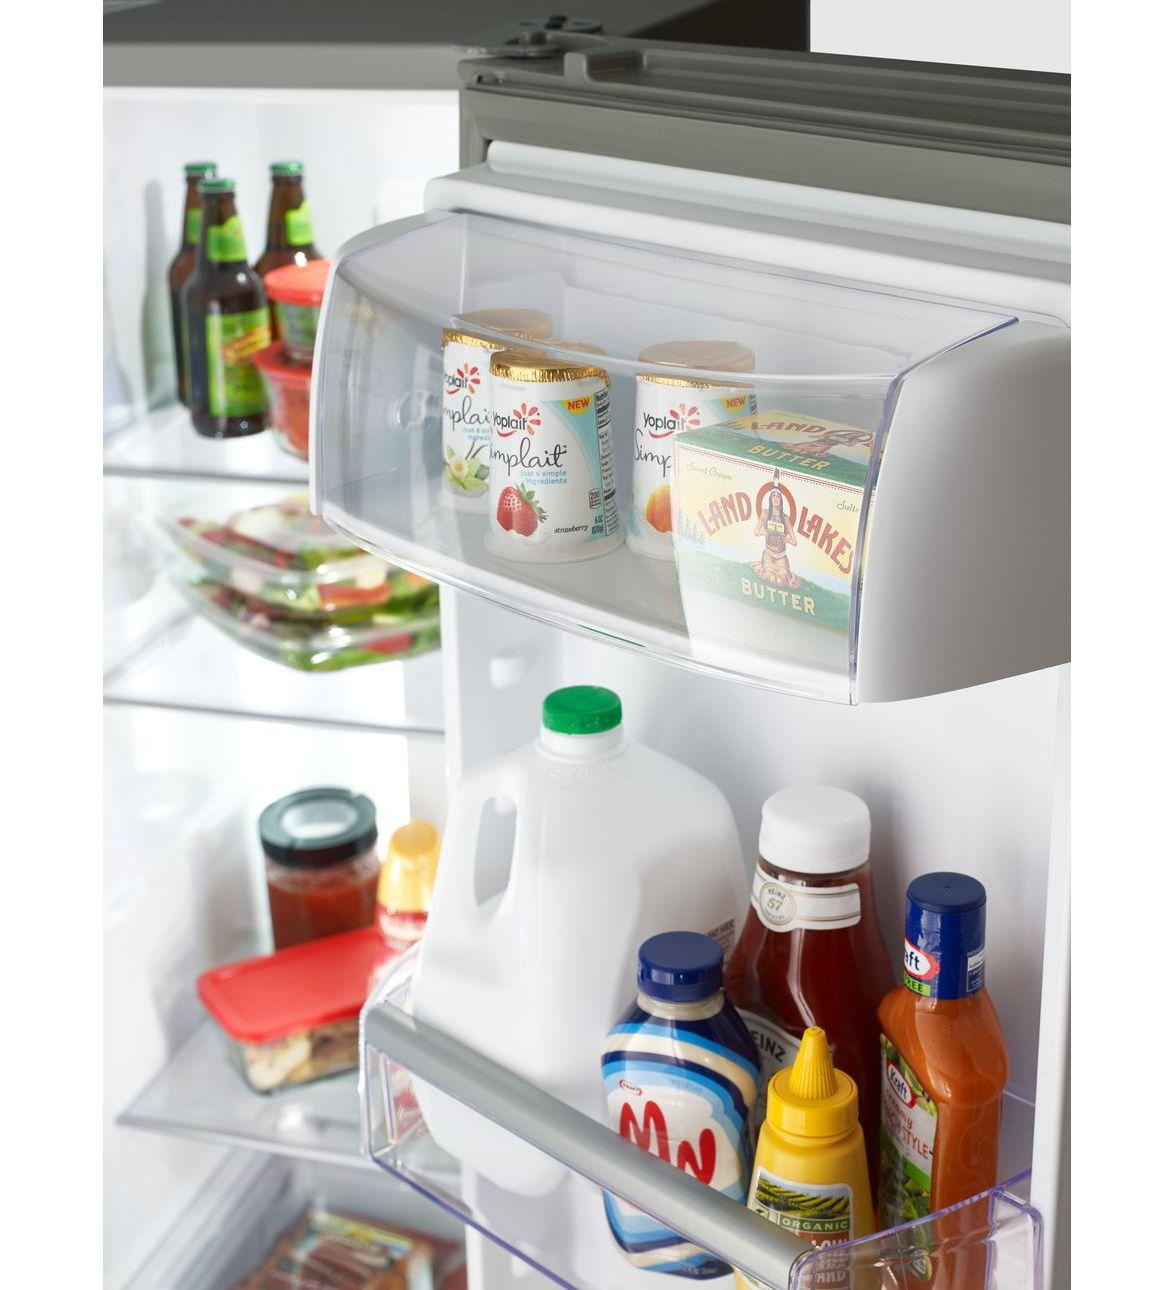 Wrs973cidm Whirlpool Wrs973cidm Side By Side Refrigerators